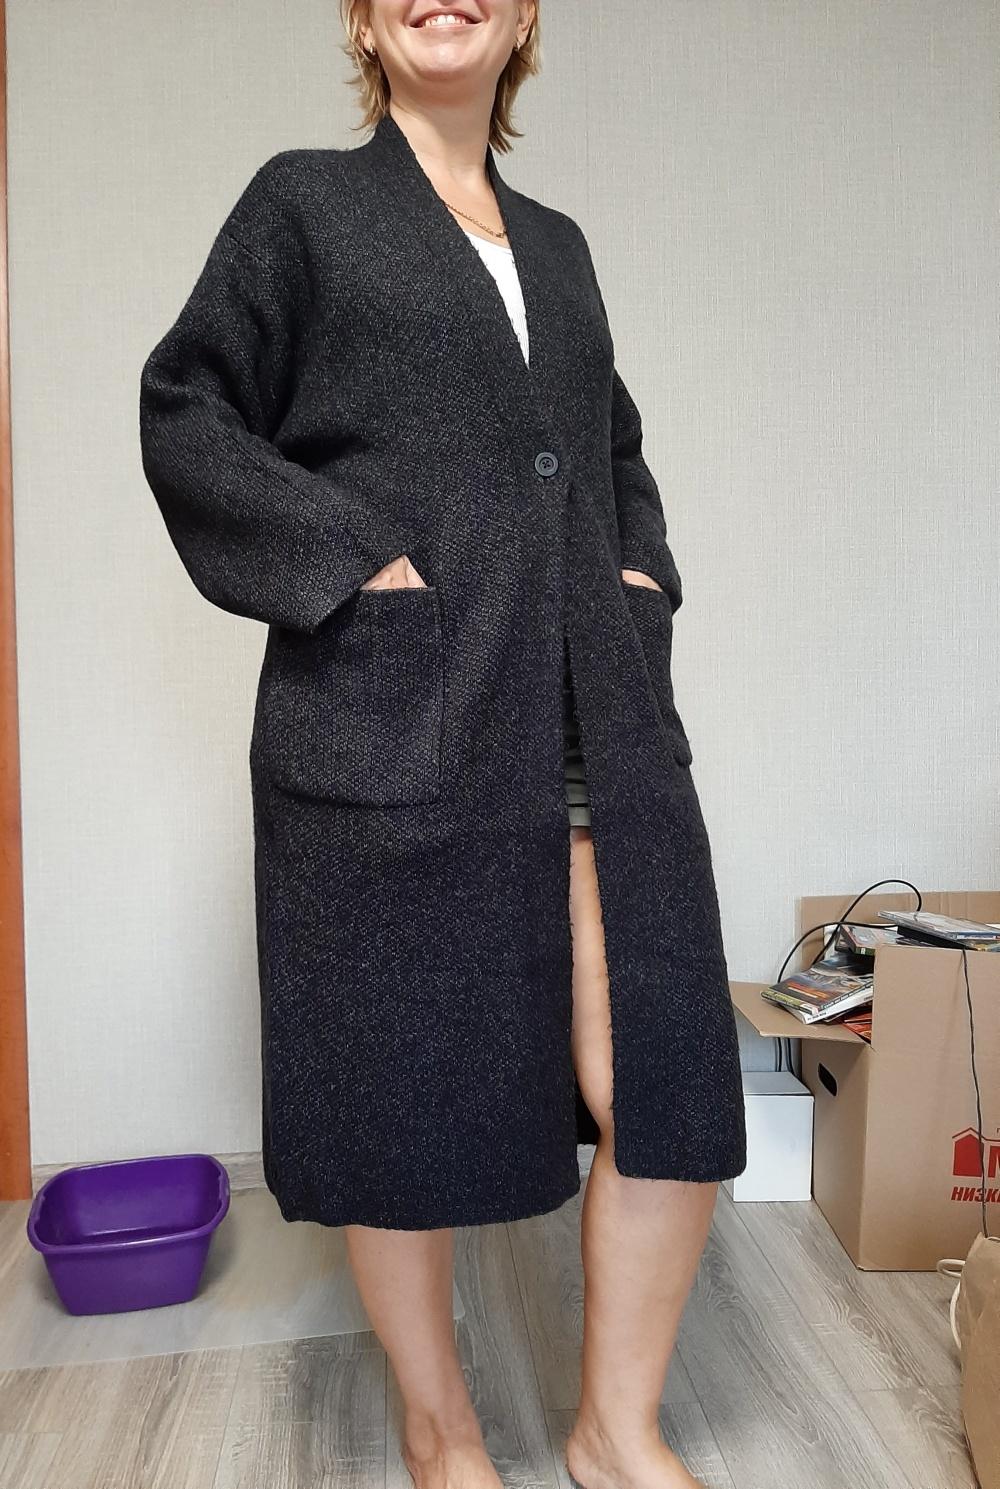 Кардиган-пальто UNICLO, L (48-50-52 размер)